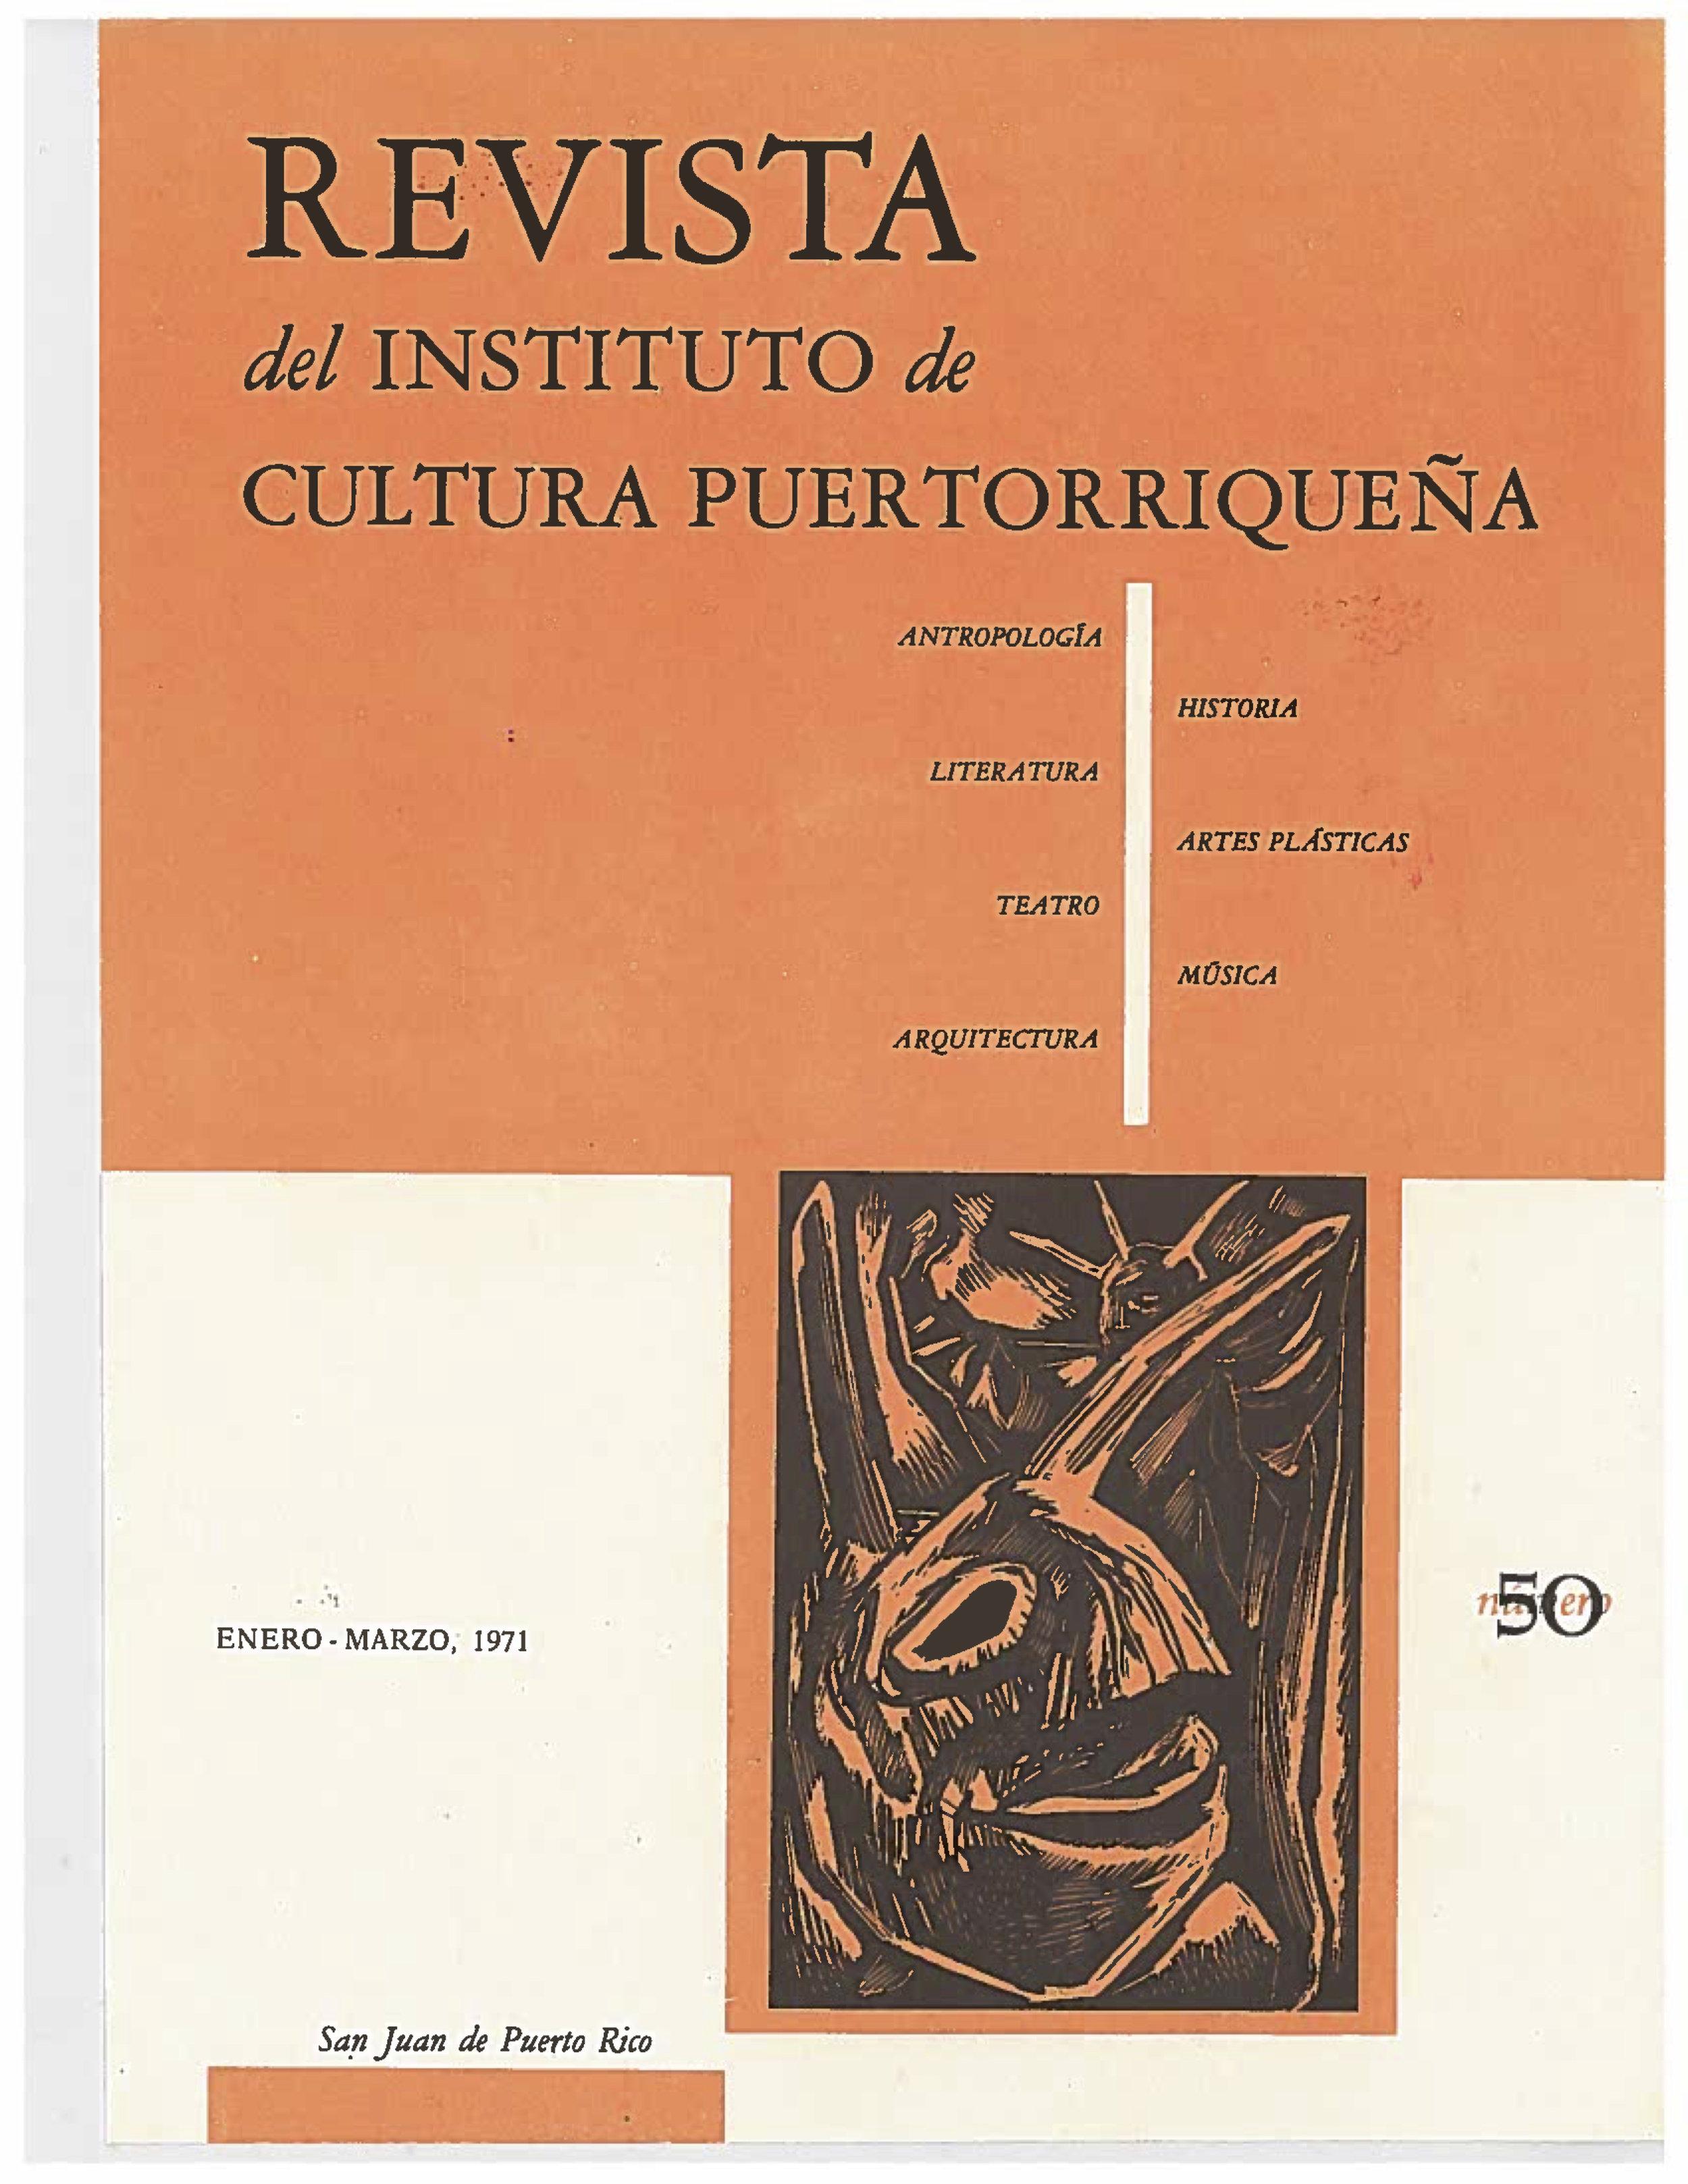 Número 50 / 1971